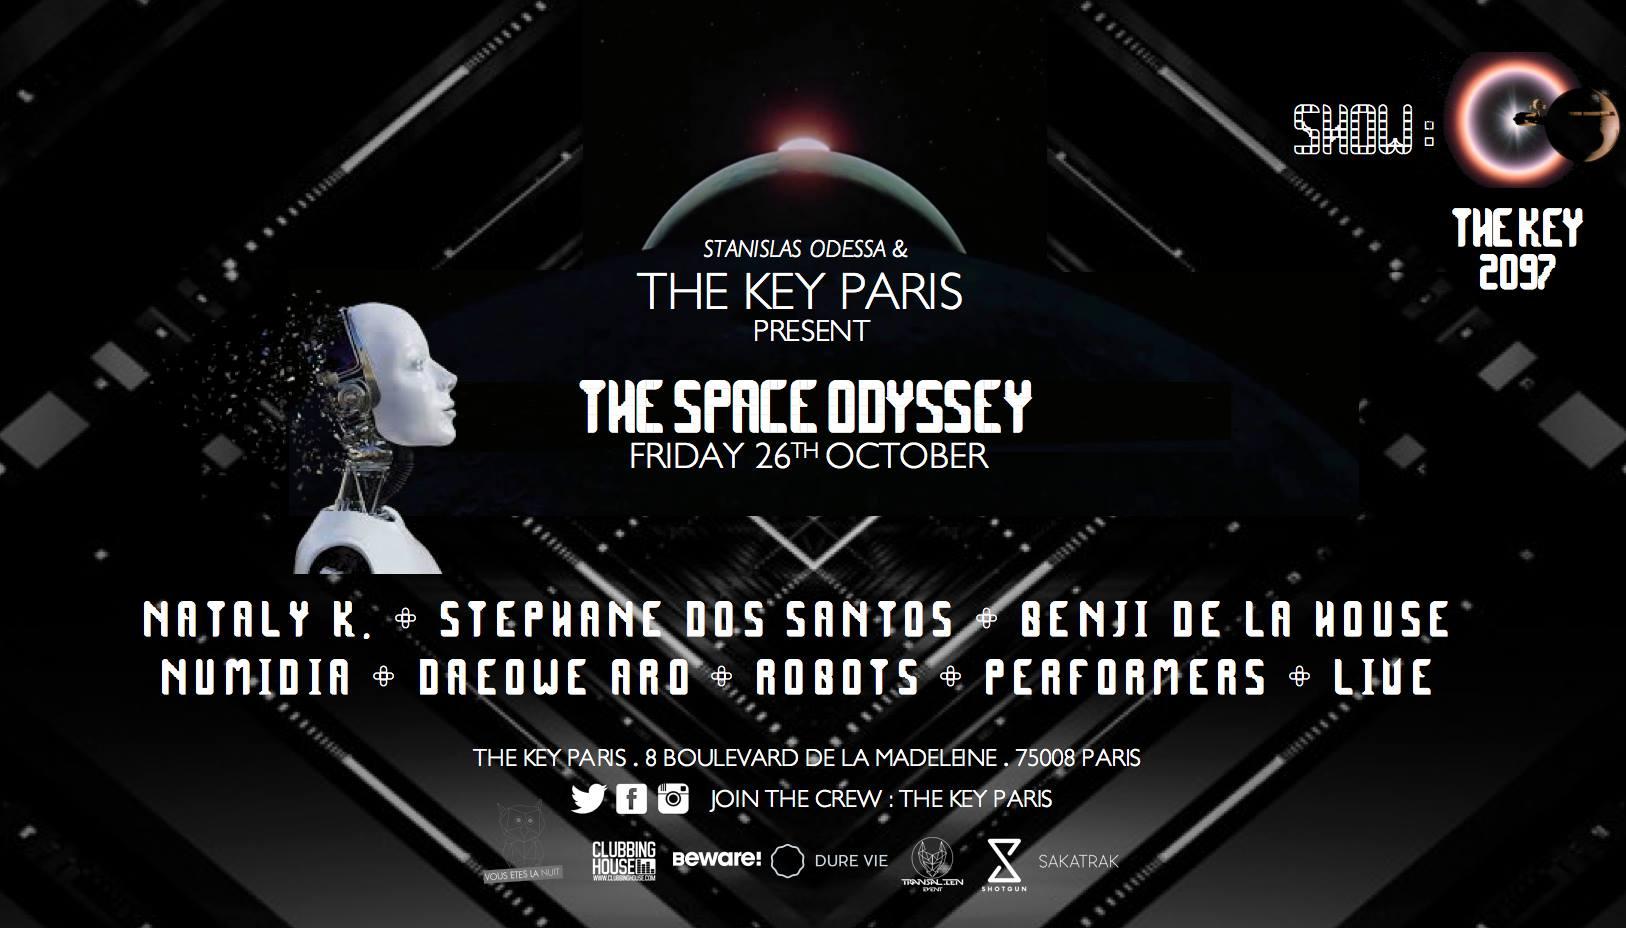 The Key Paris x The Space Odyssey